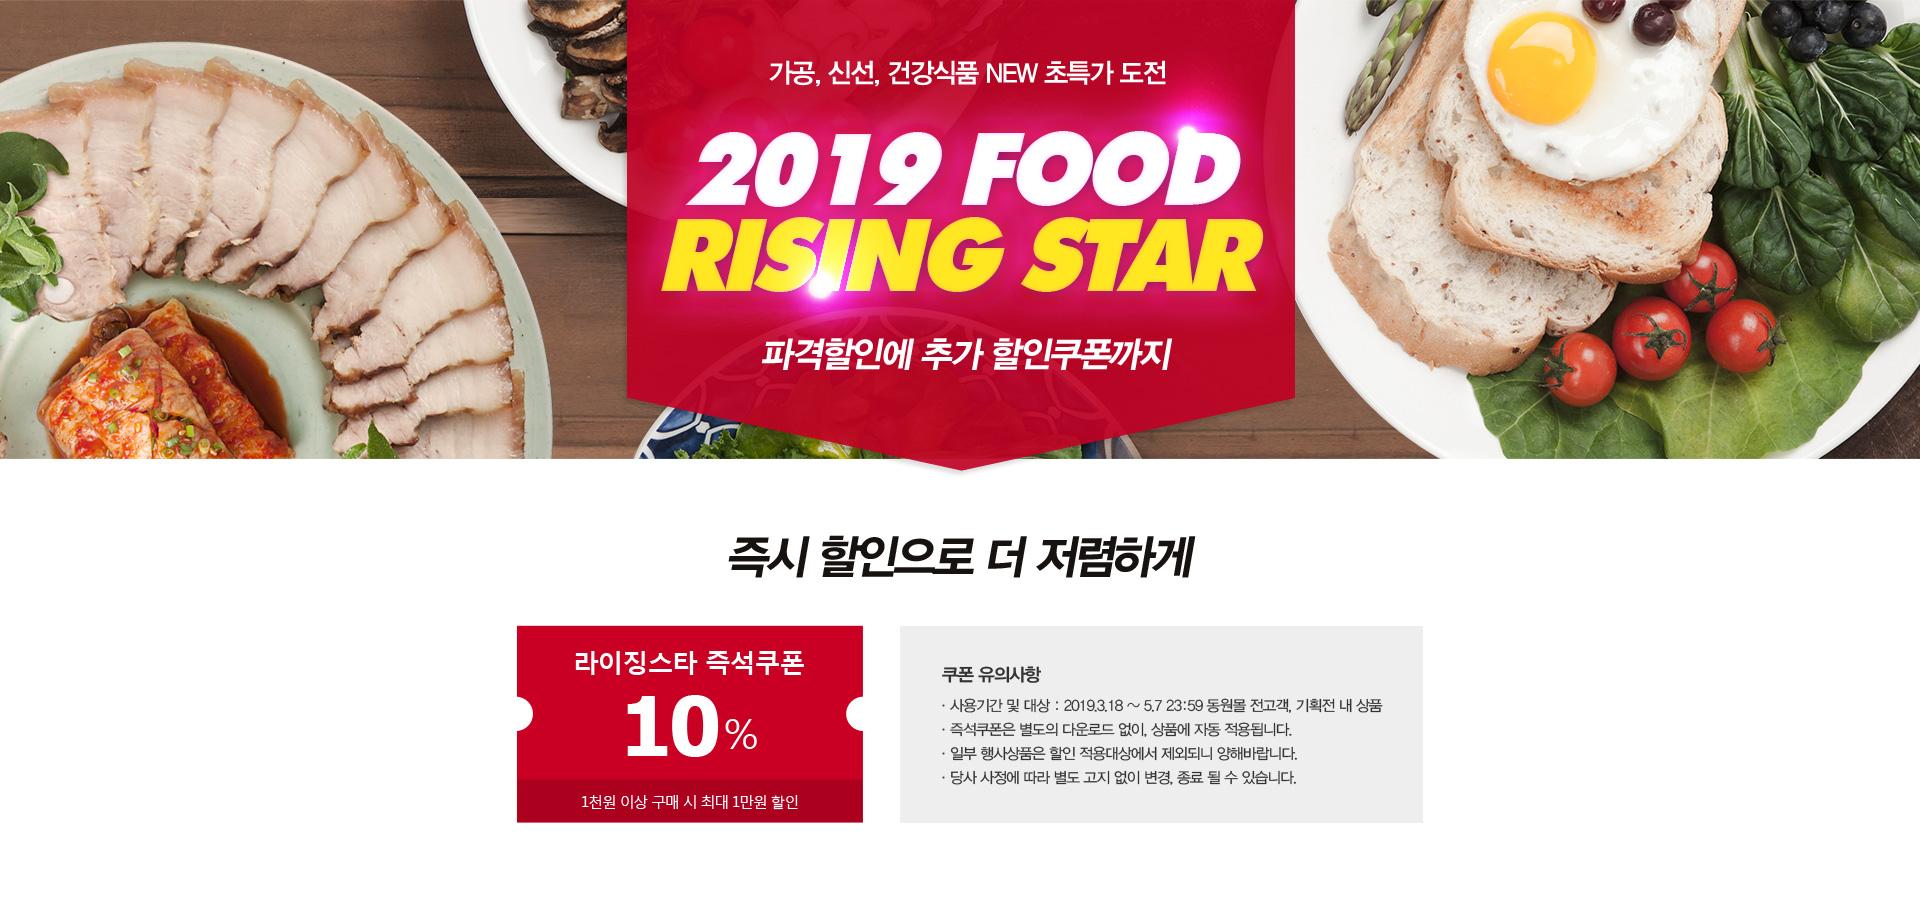 2019 FOOD RISING STAR 식품 NEW 초특가 도전 파격할인에 추가 할인까지 즉시 할인으로 더 저렴하게 라이징스타 즉석쿠폰 10%